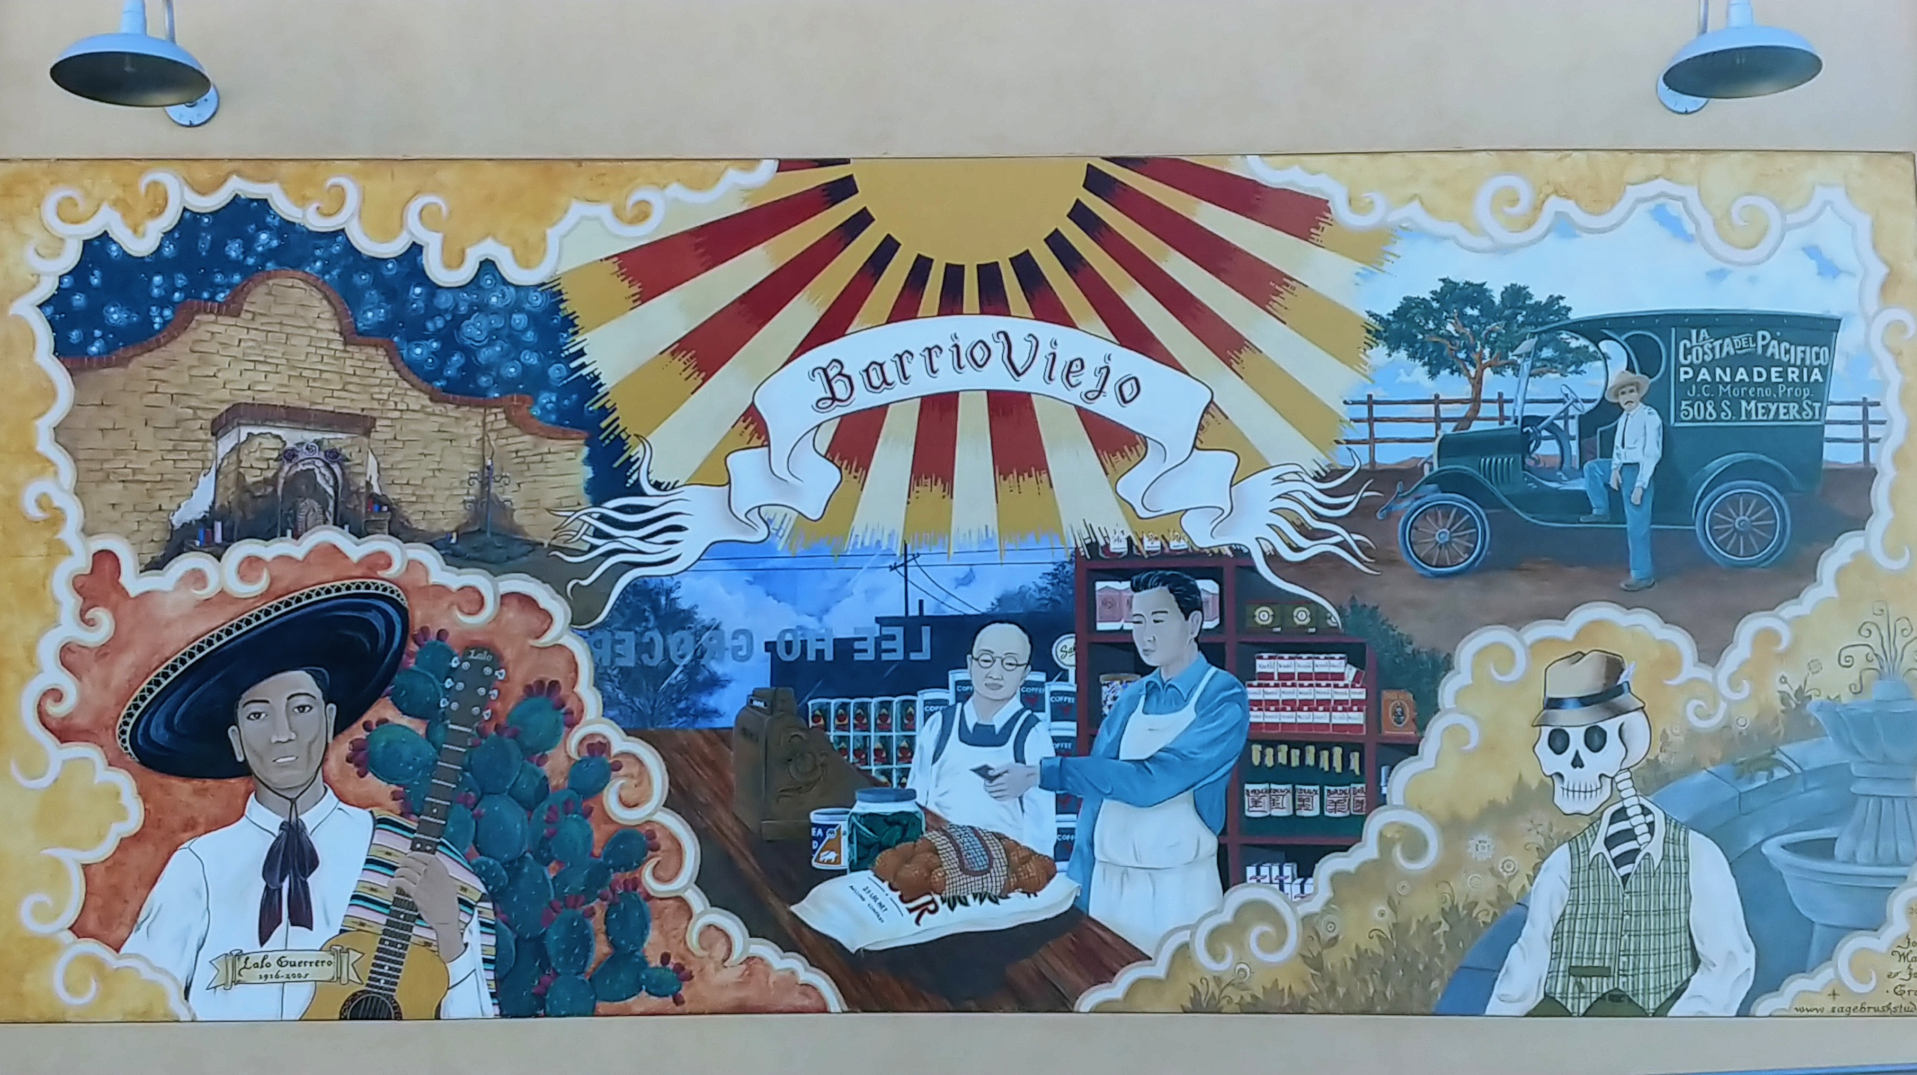 Tucson Mural Barrio Viejo